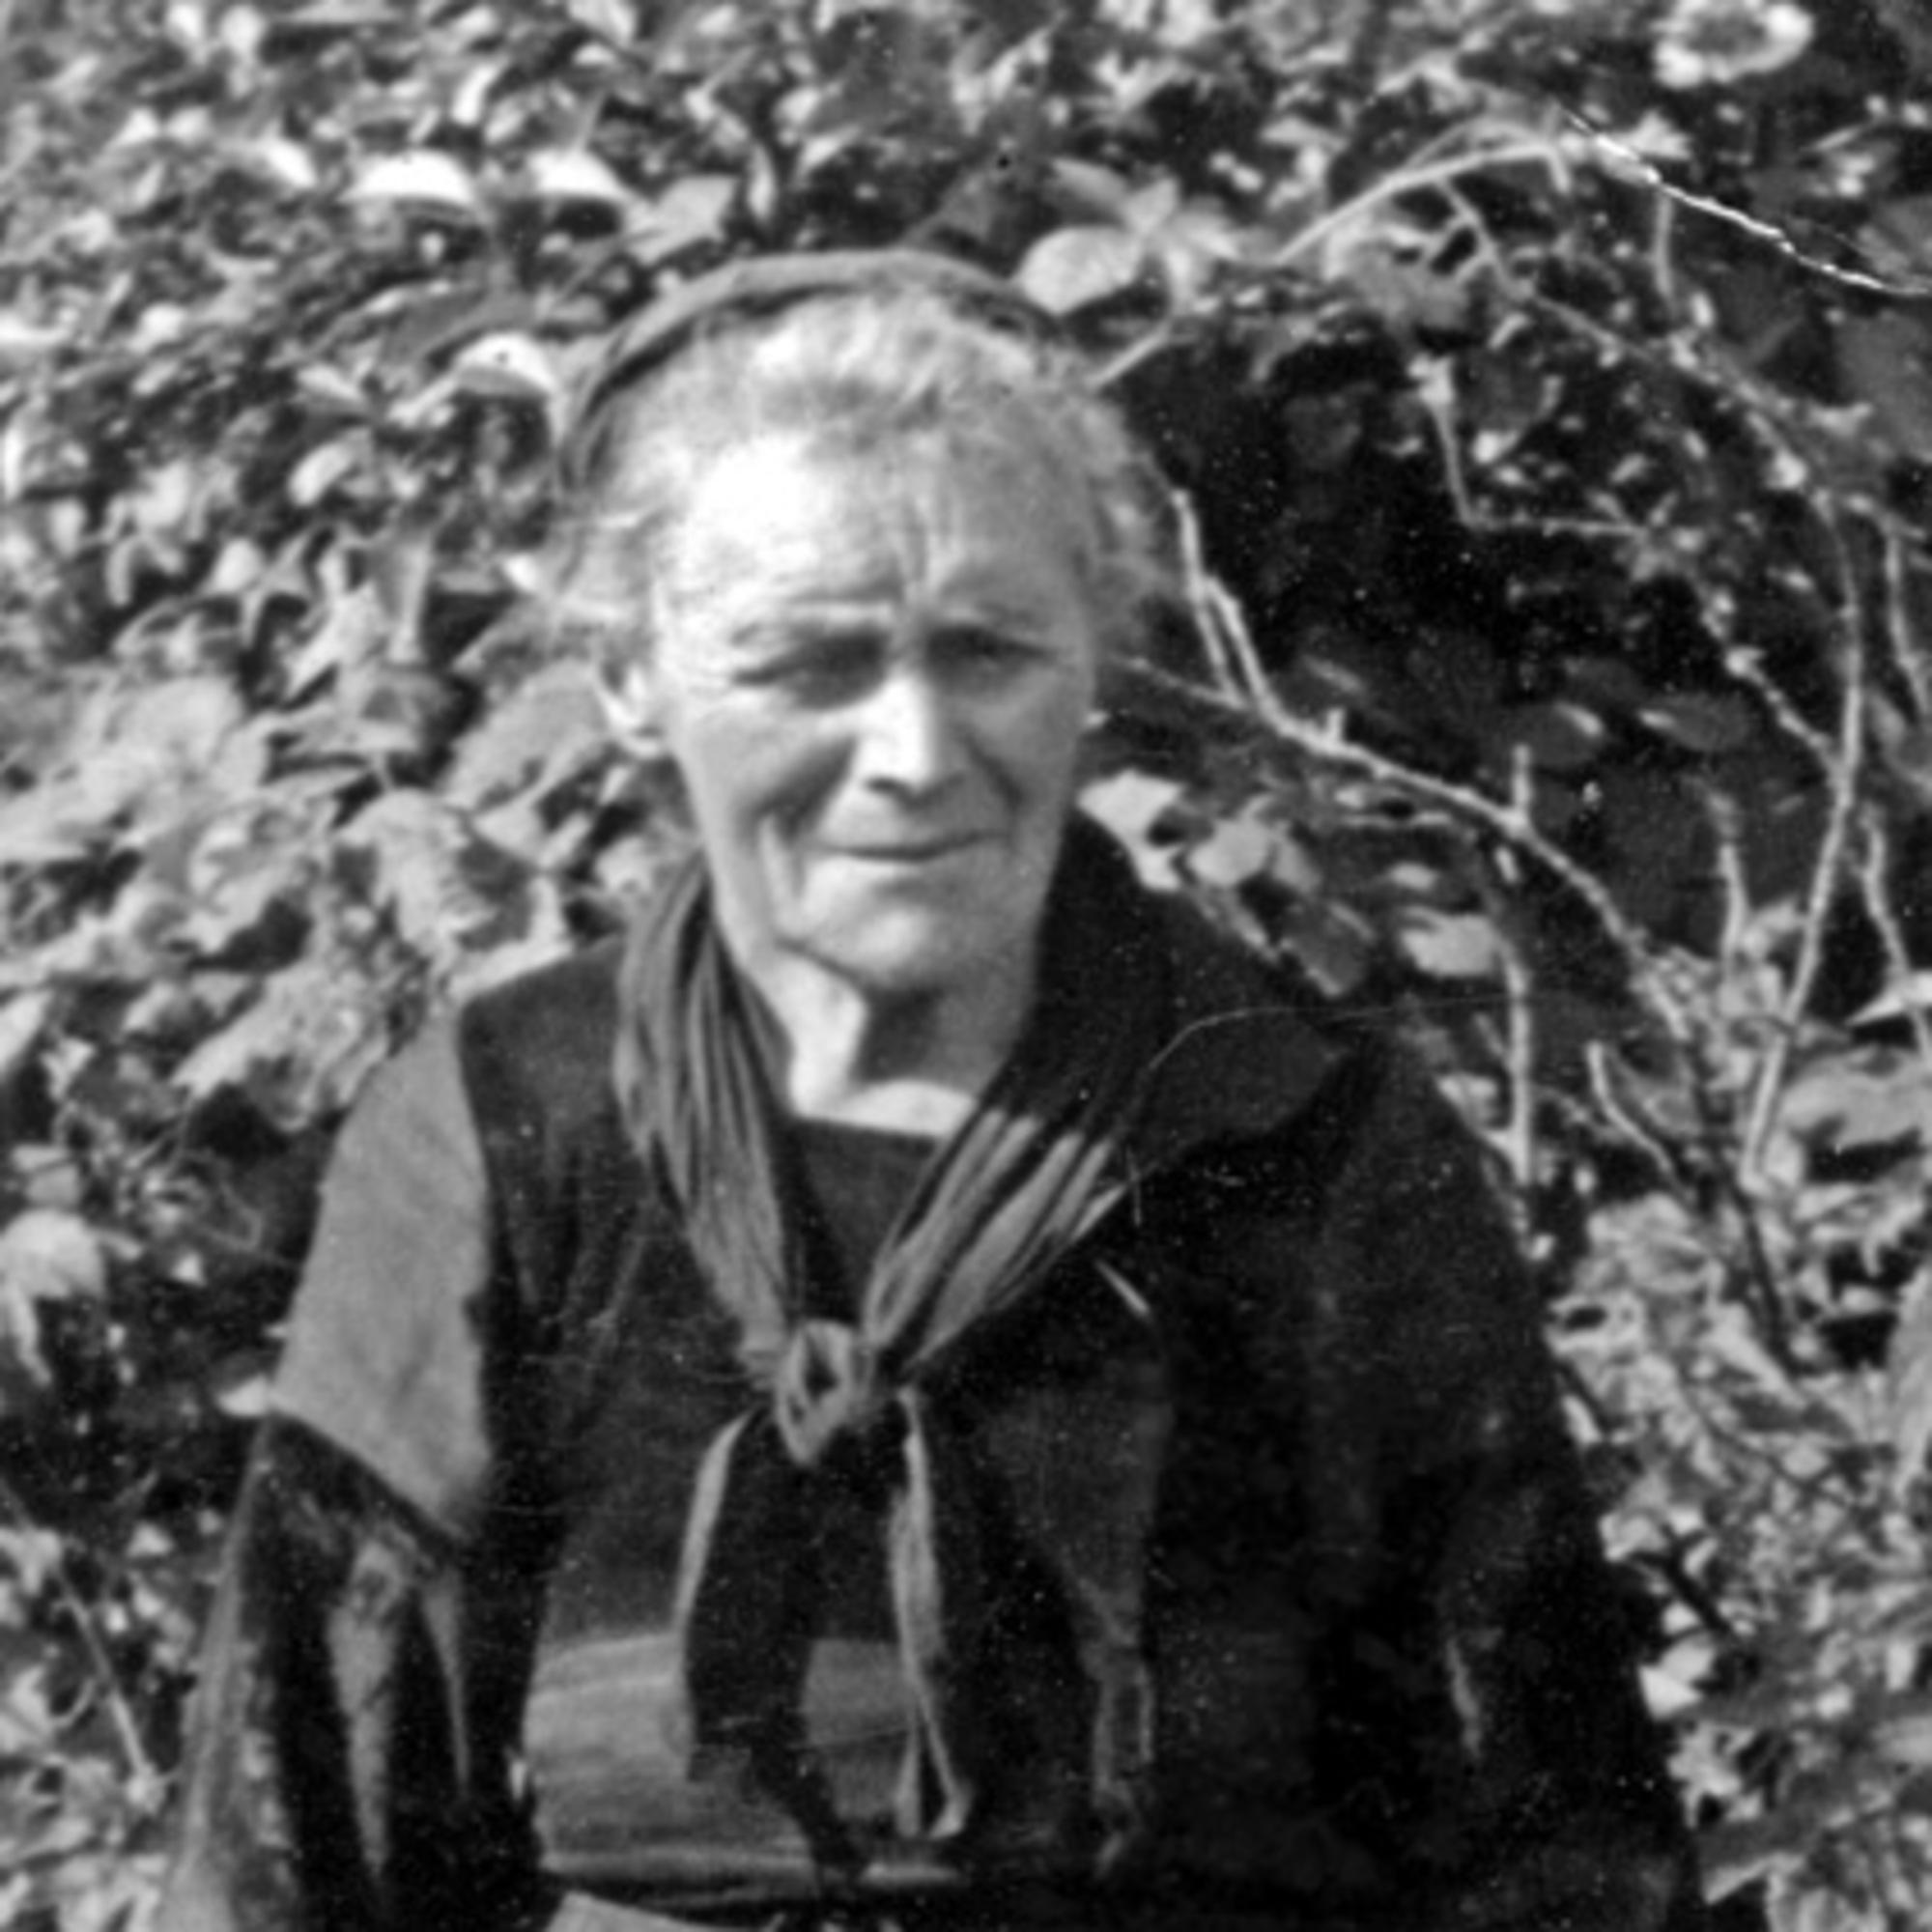 Marie-Jeanne Riou portrait